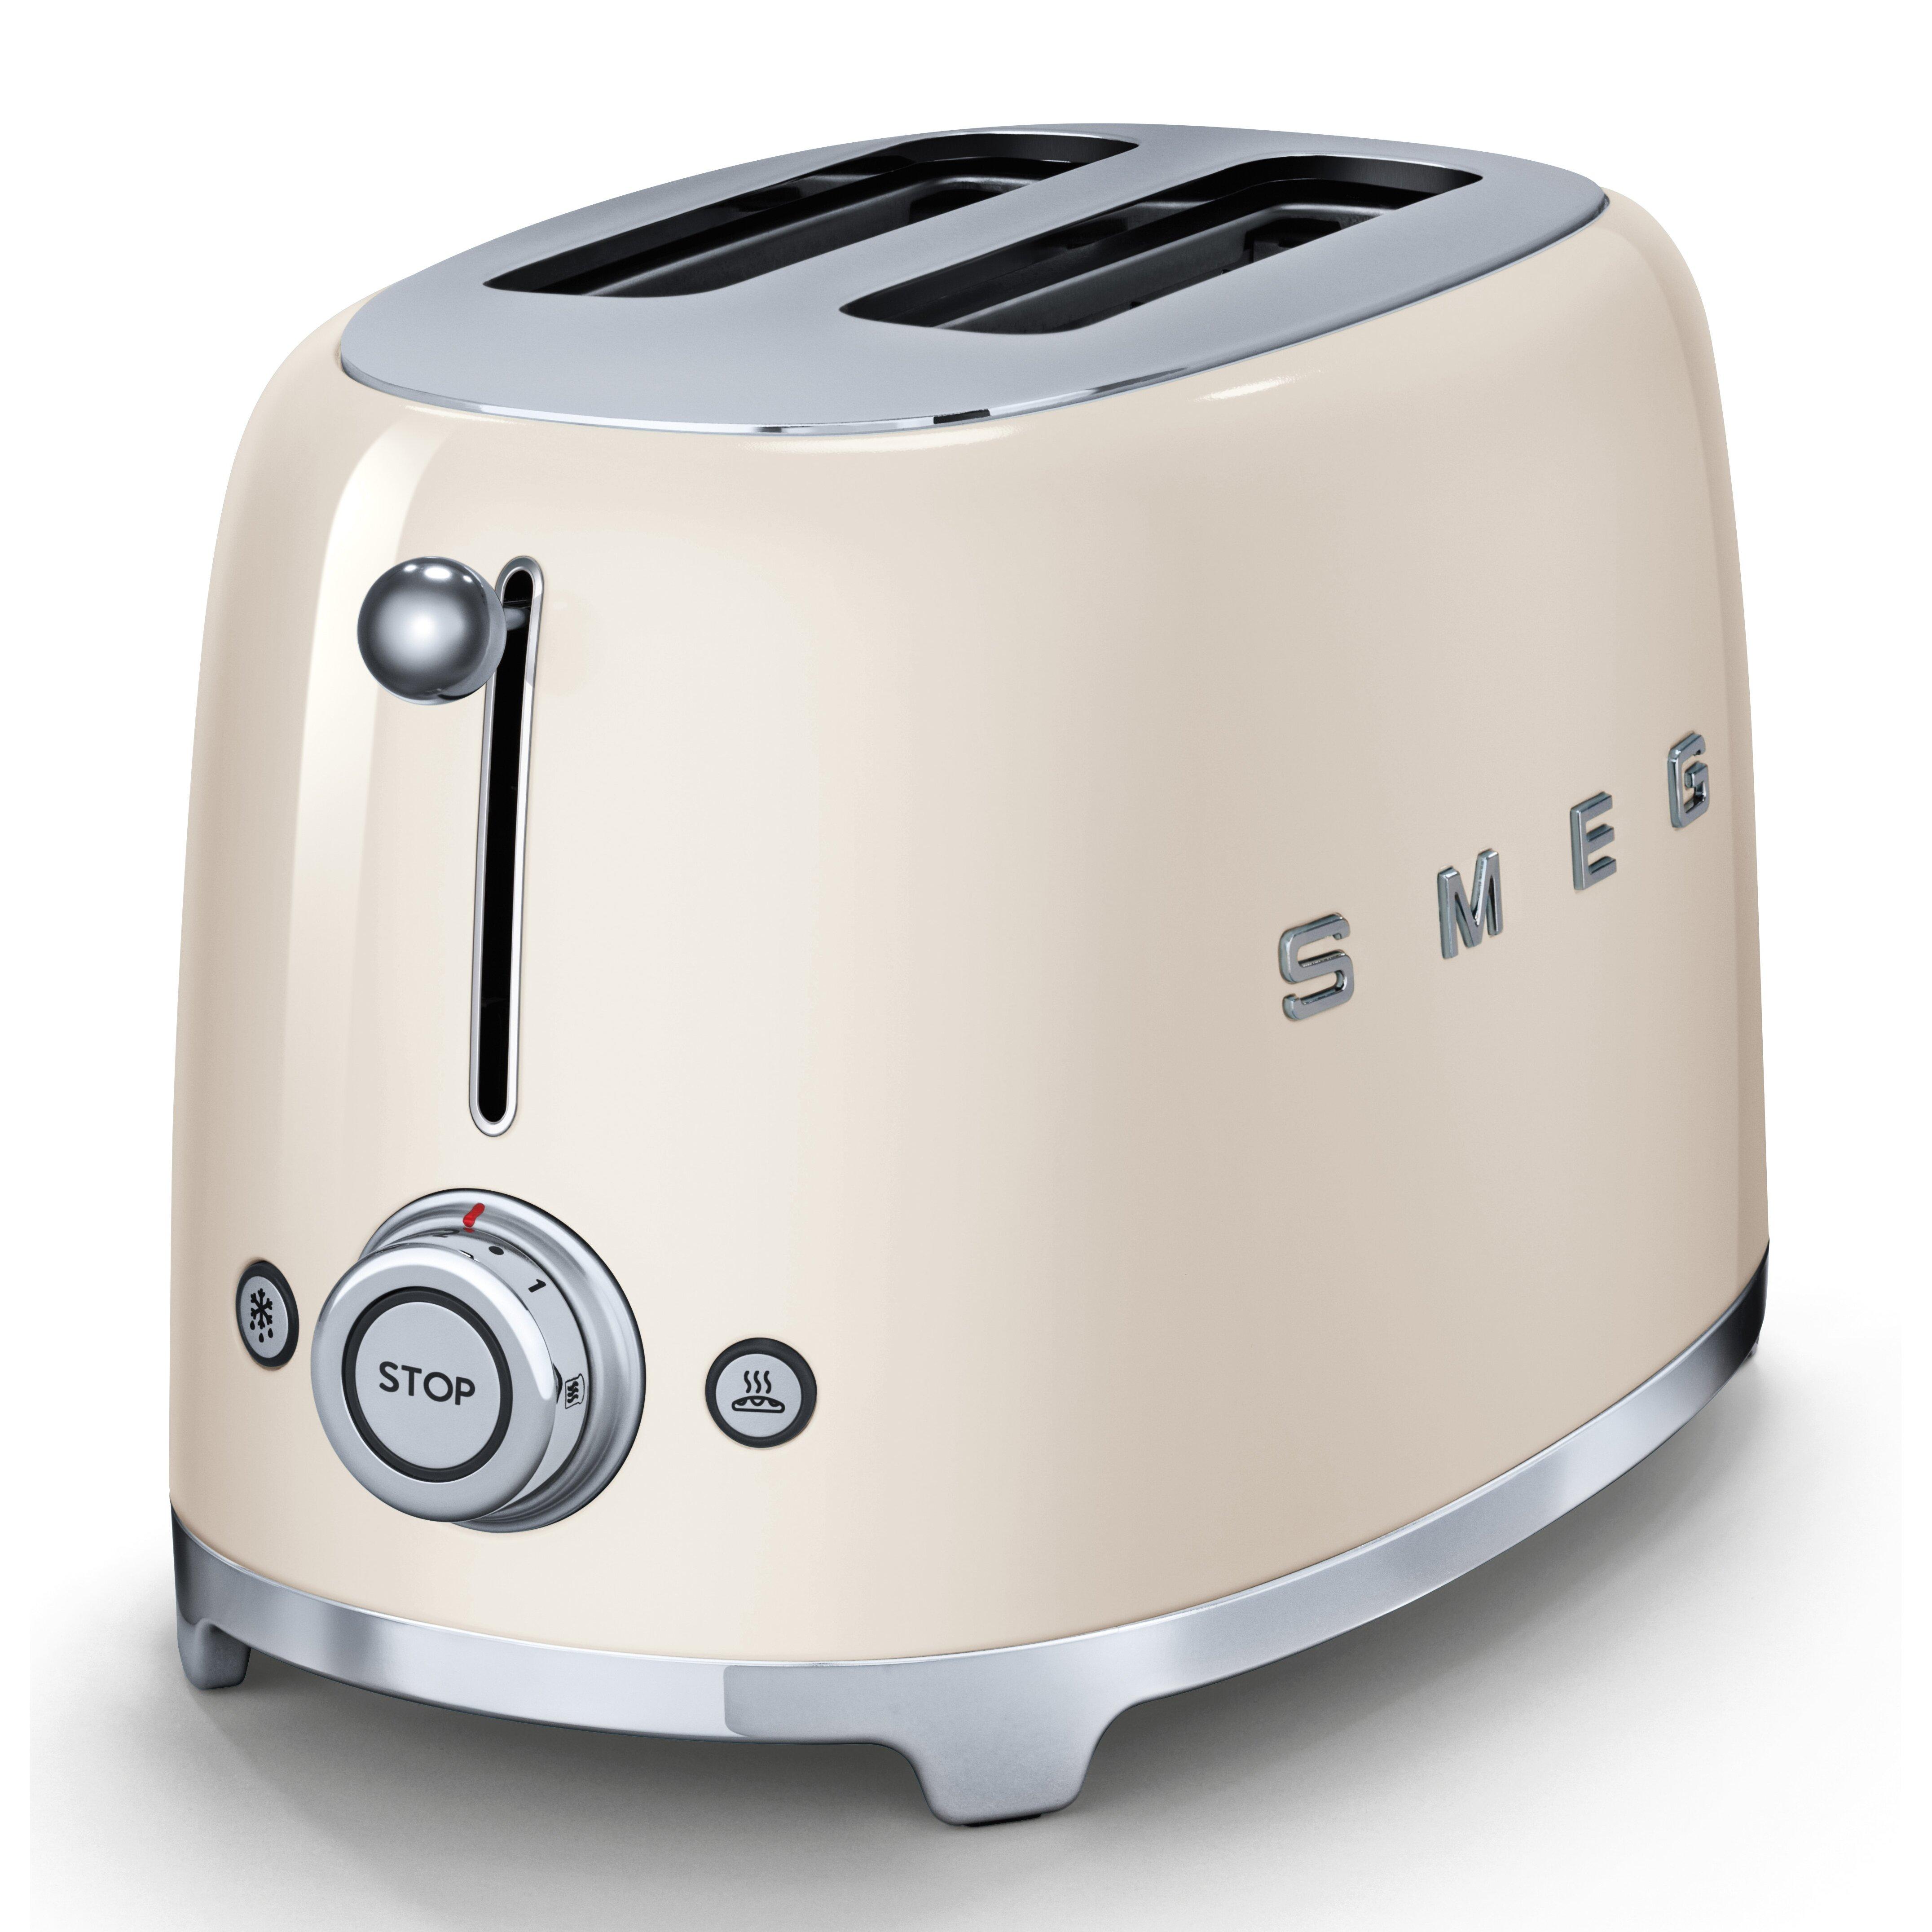 Uncategorized 50s Style Kitchen Appliances smeg 50s style 2 slice toaster reviews wayfair kitchen wayfair